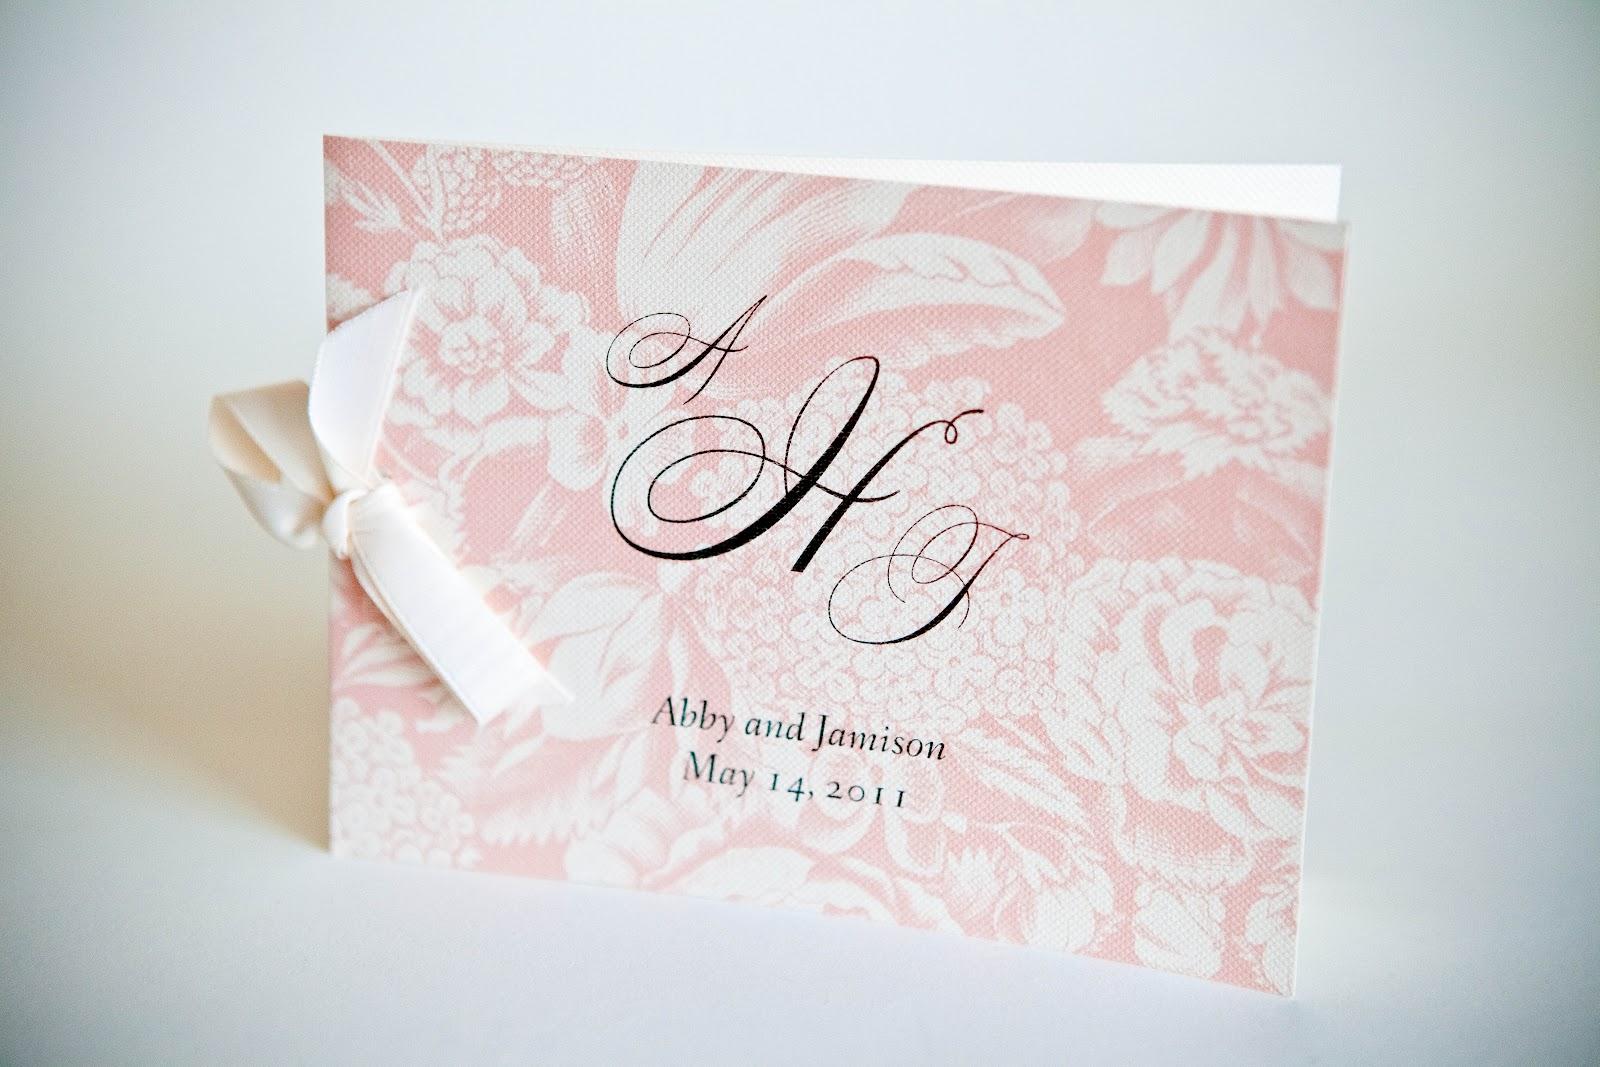 Wedding Program • Wedding Invitations Baltimore Kindly RSVP Designs Blog